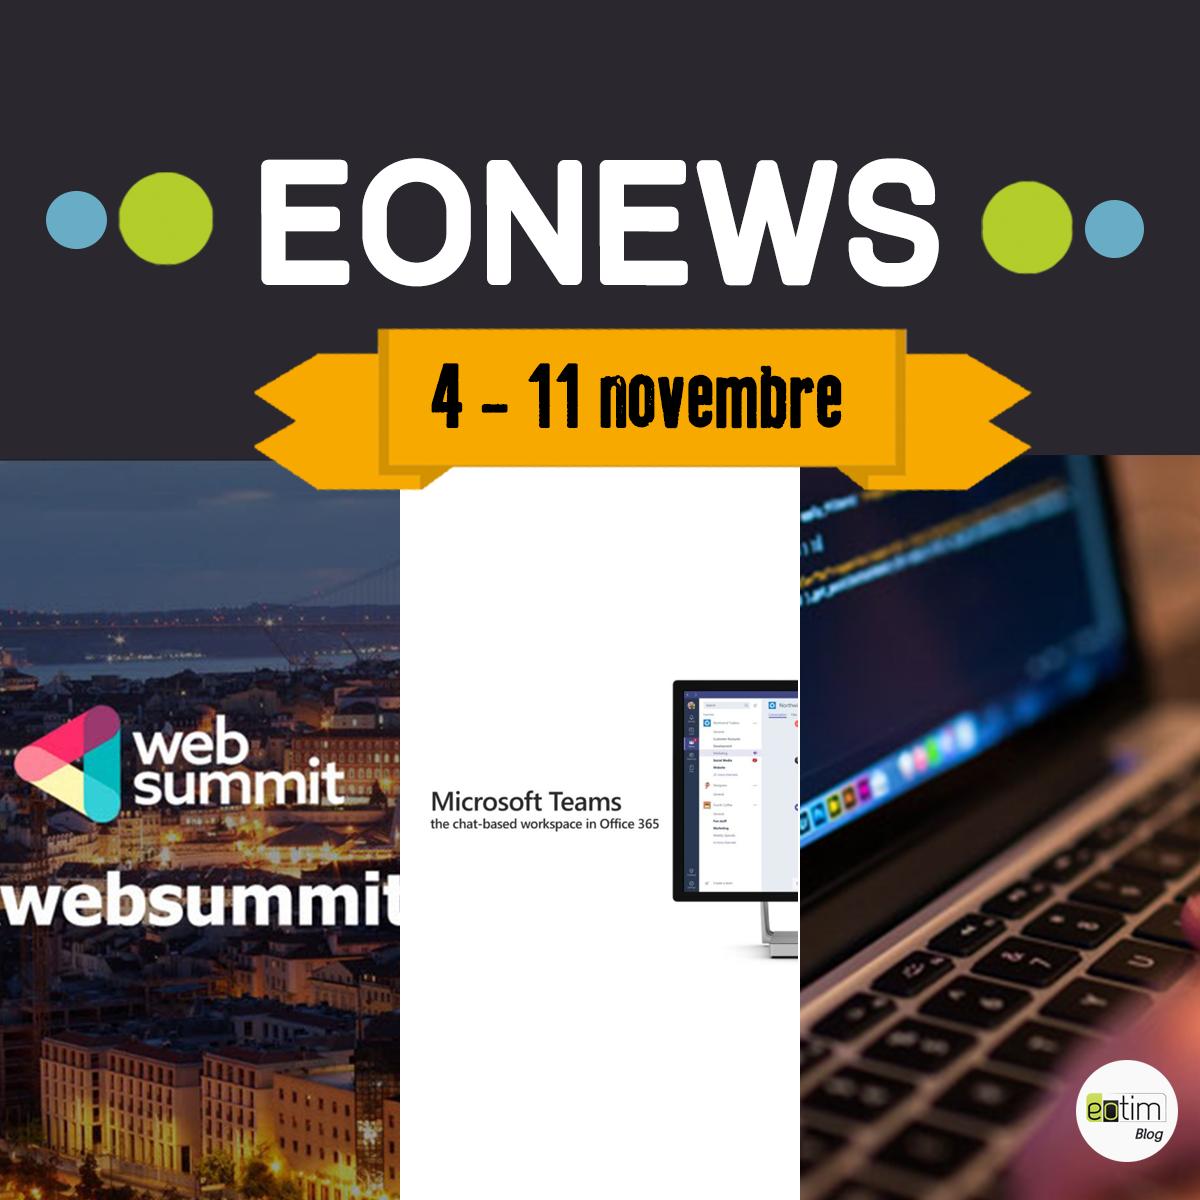 Eonews : l'essentiel de la semaine (4-11 novembre)